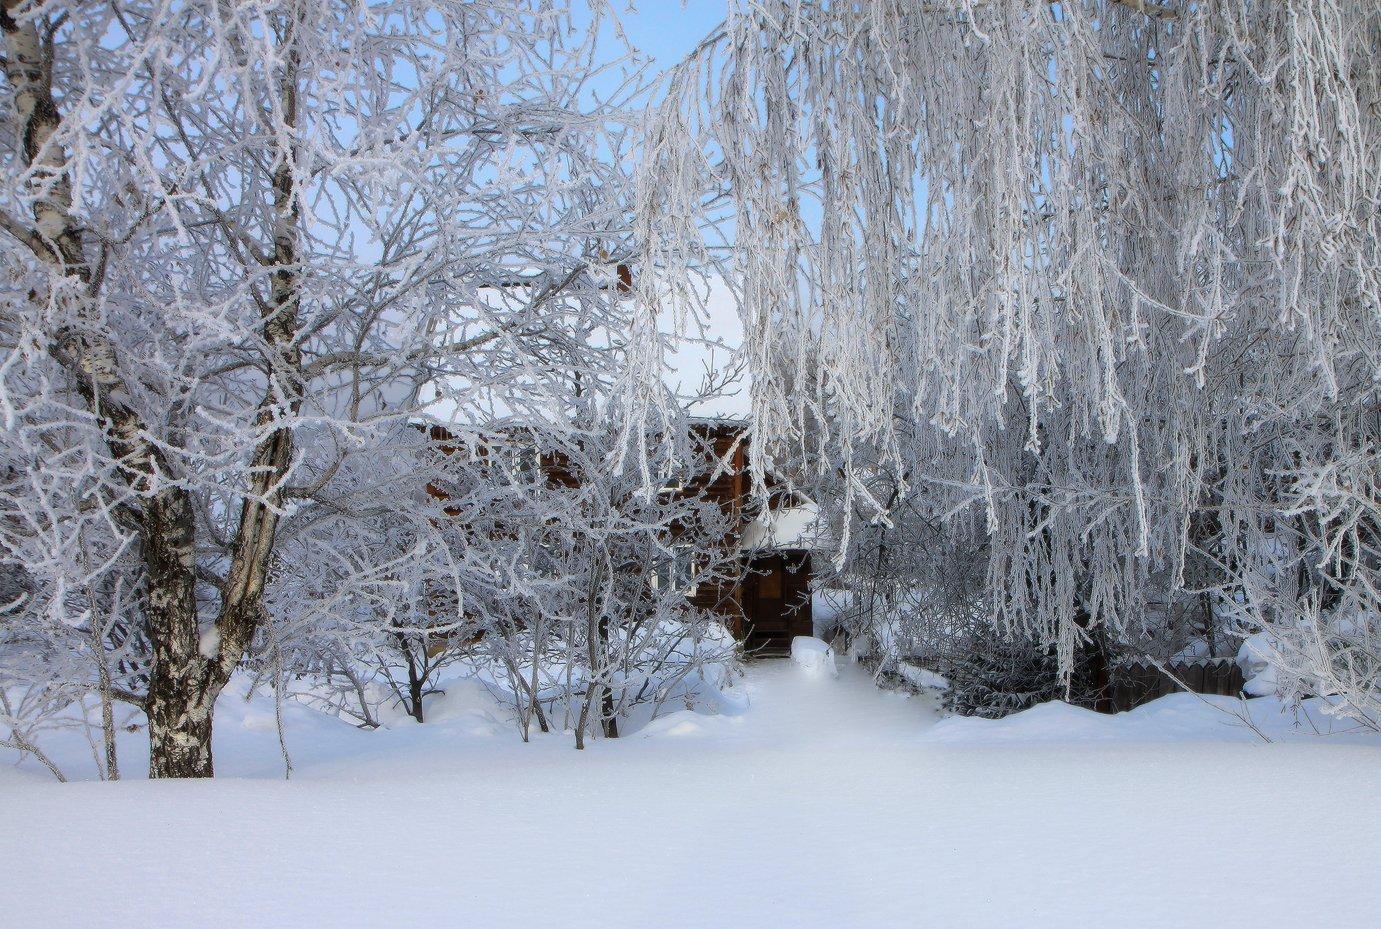 новокузнецк, сибирь, снег, зима, Хвостенко Галина